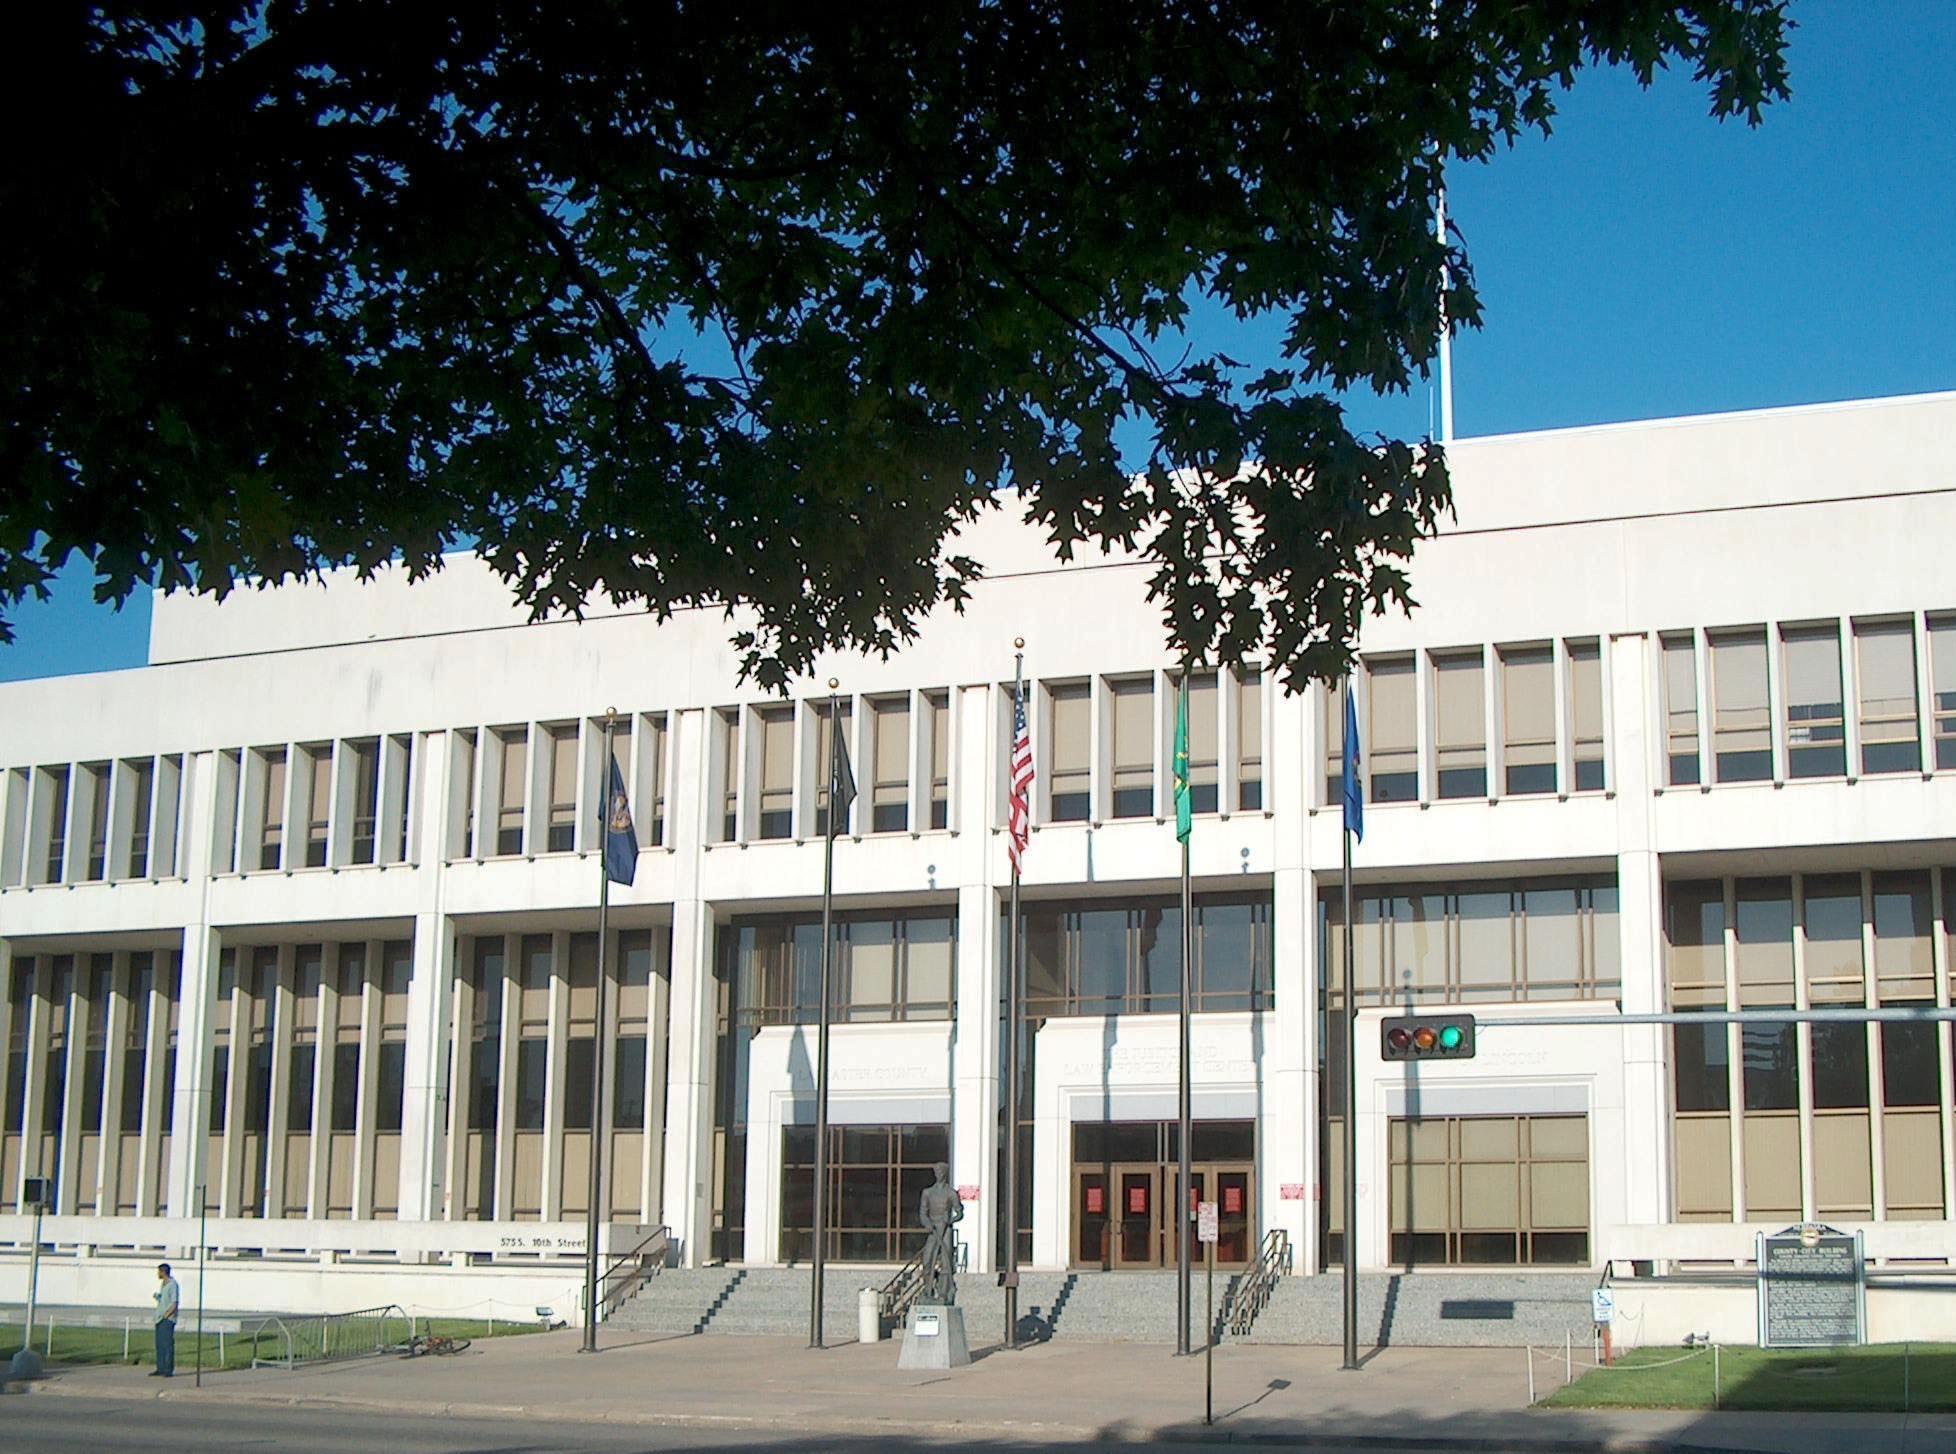 Lancaster County Courthouse, Lincoln, Nebraska